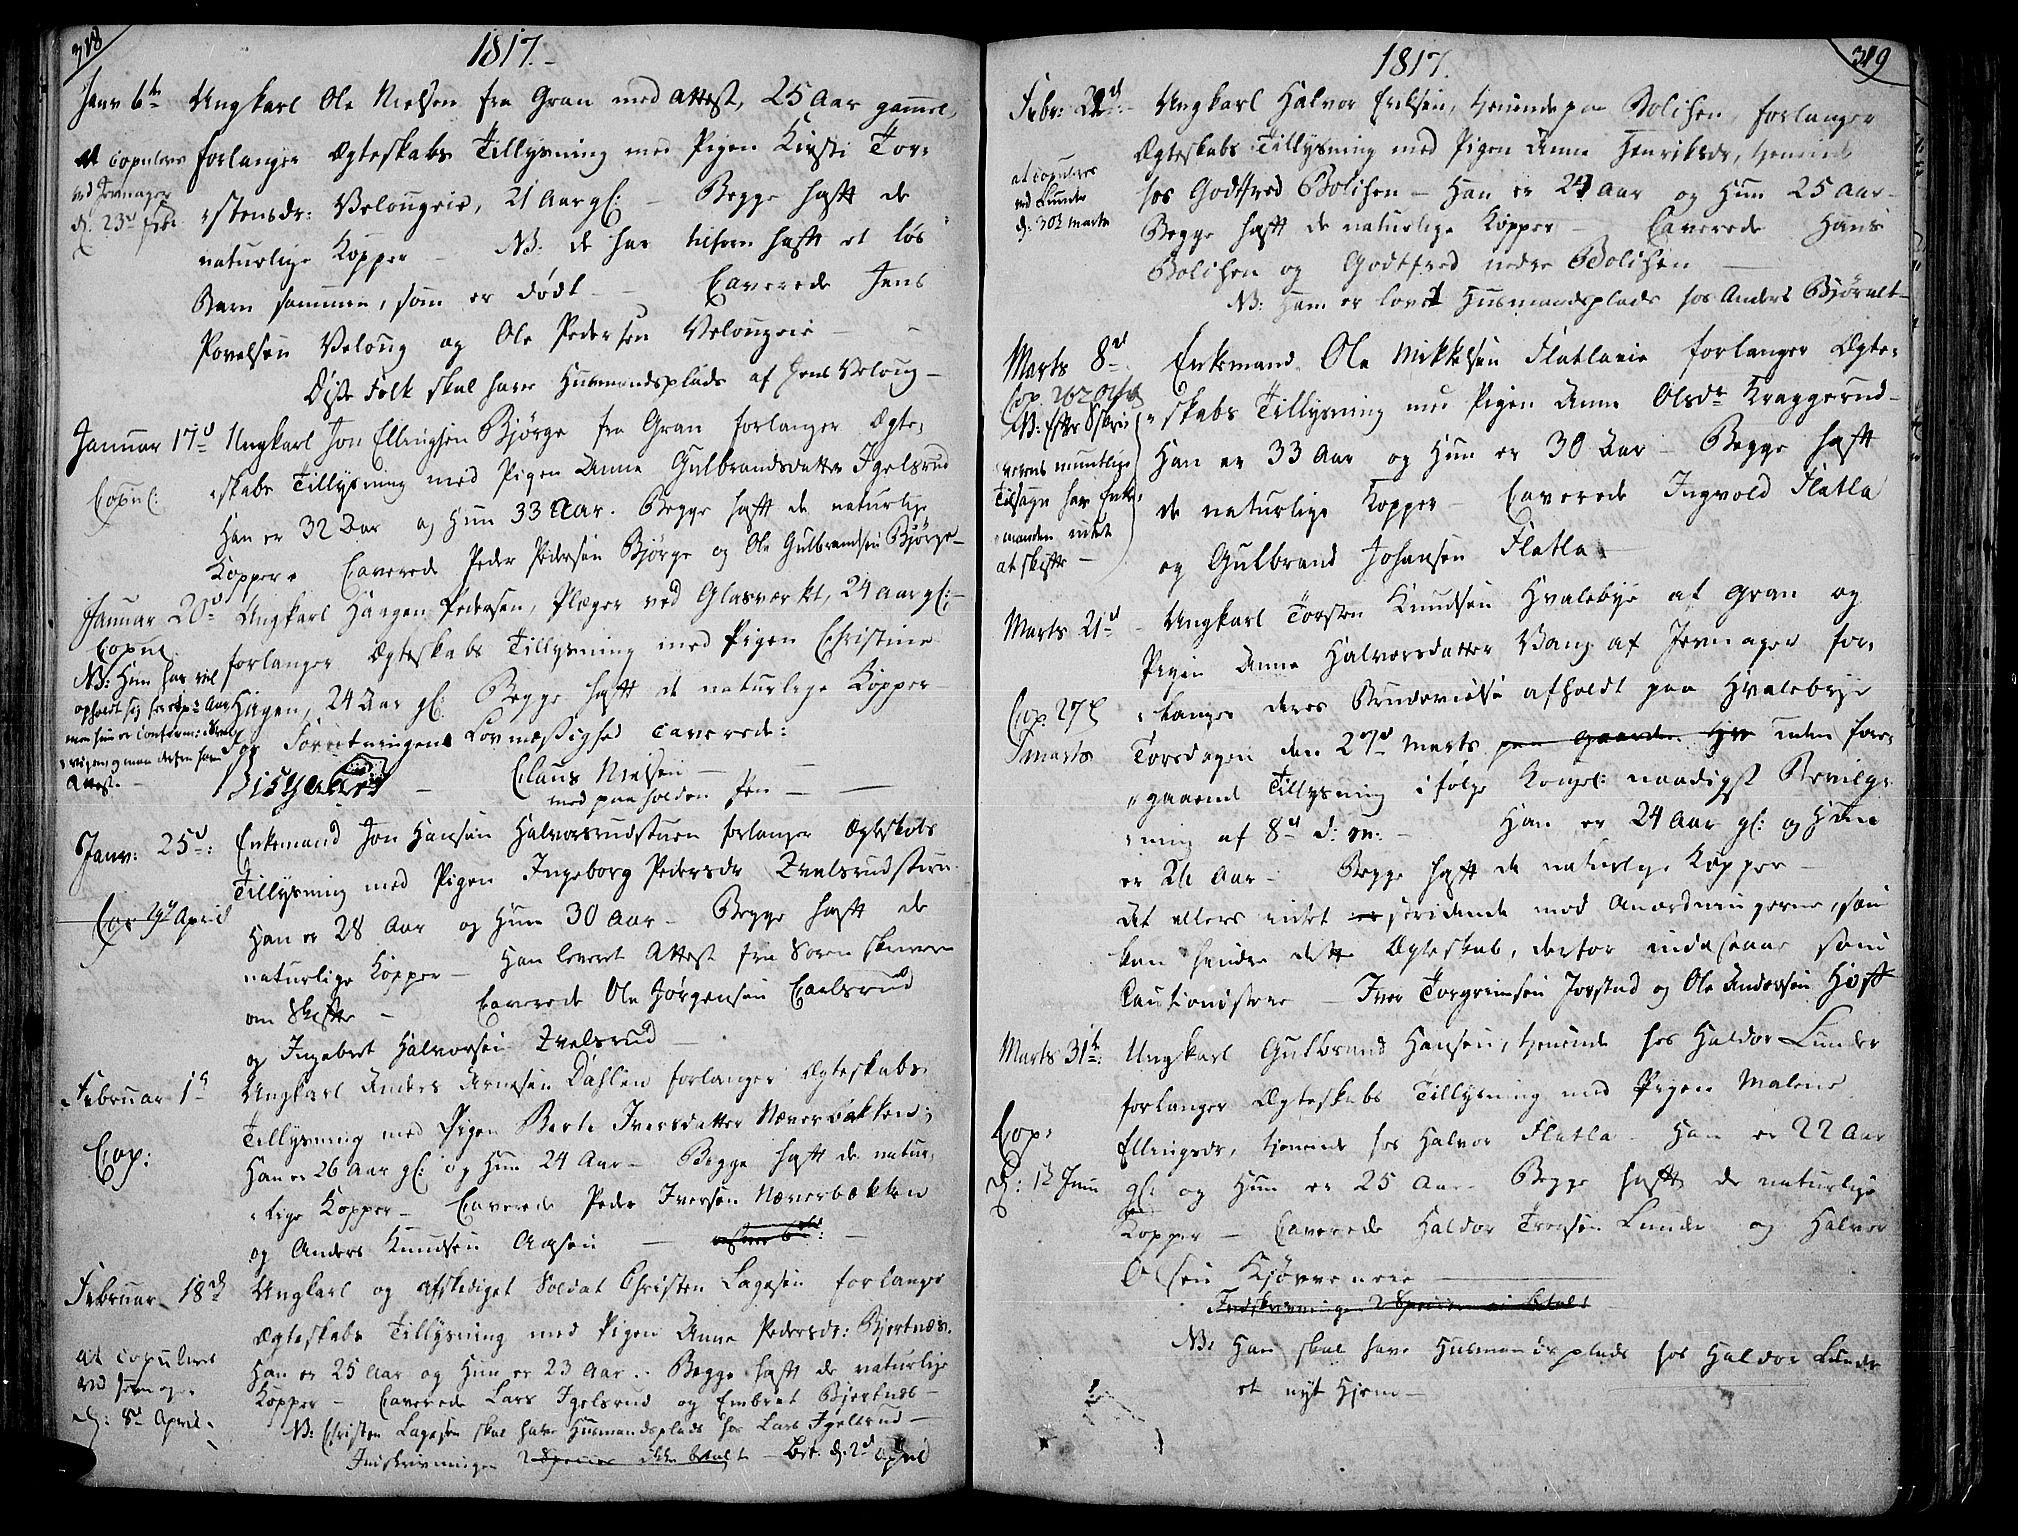 SAH, Jevnaker prestekontor, Ministerialbok nr. 4, 1800-1861, s. 318-319